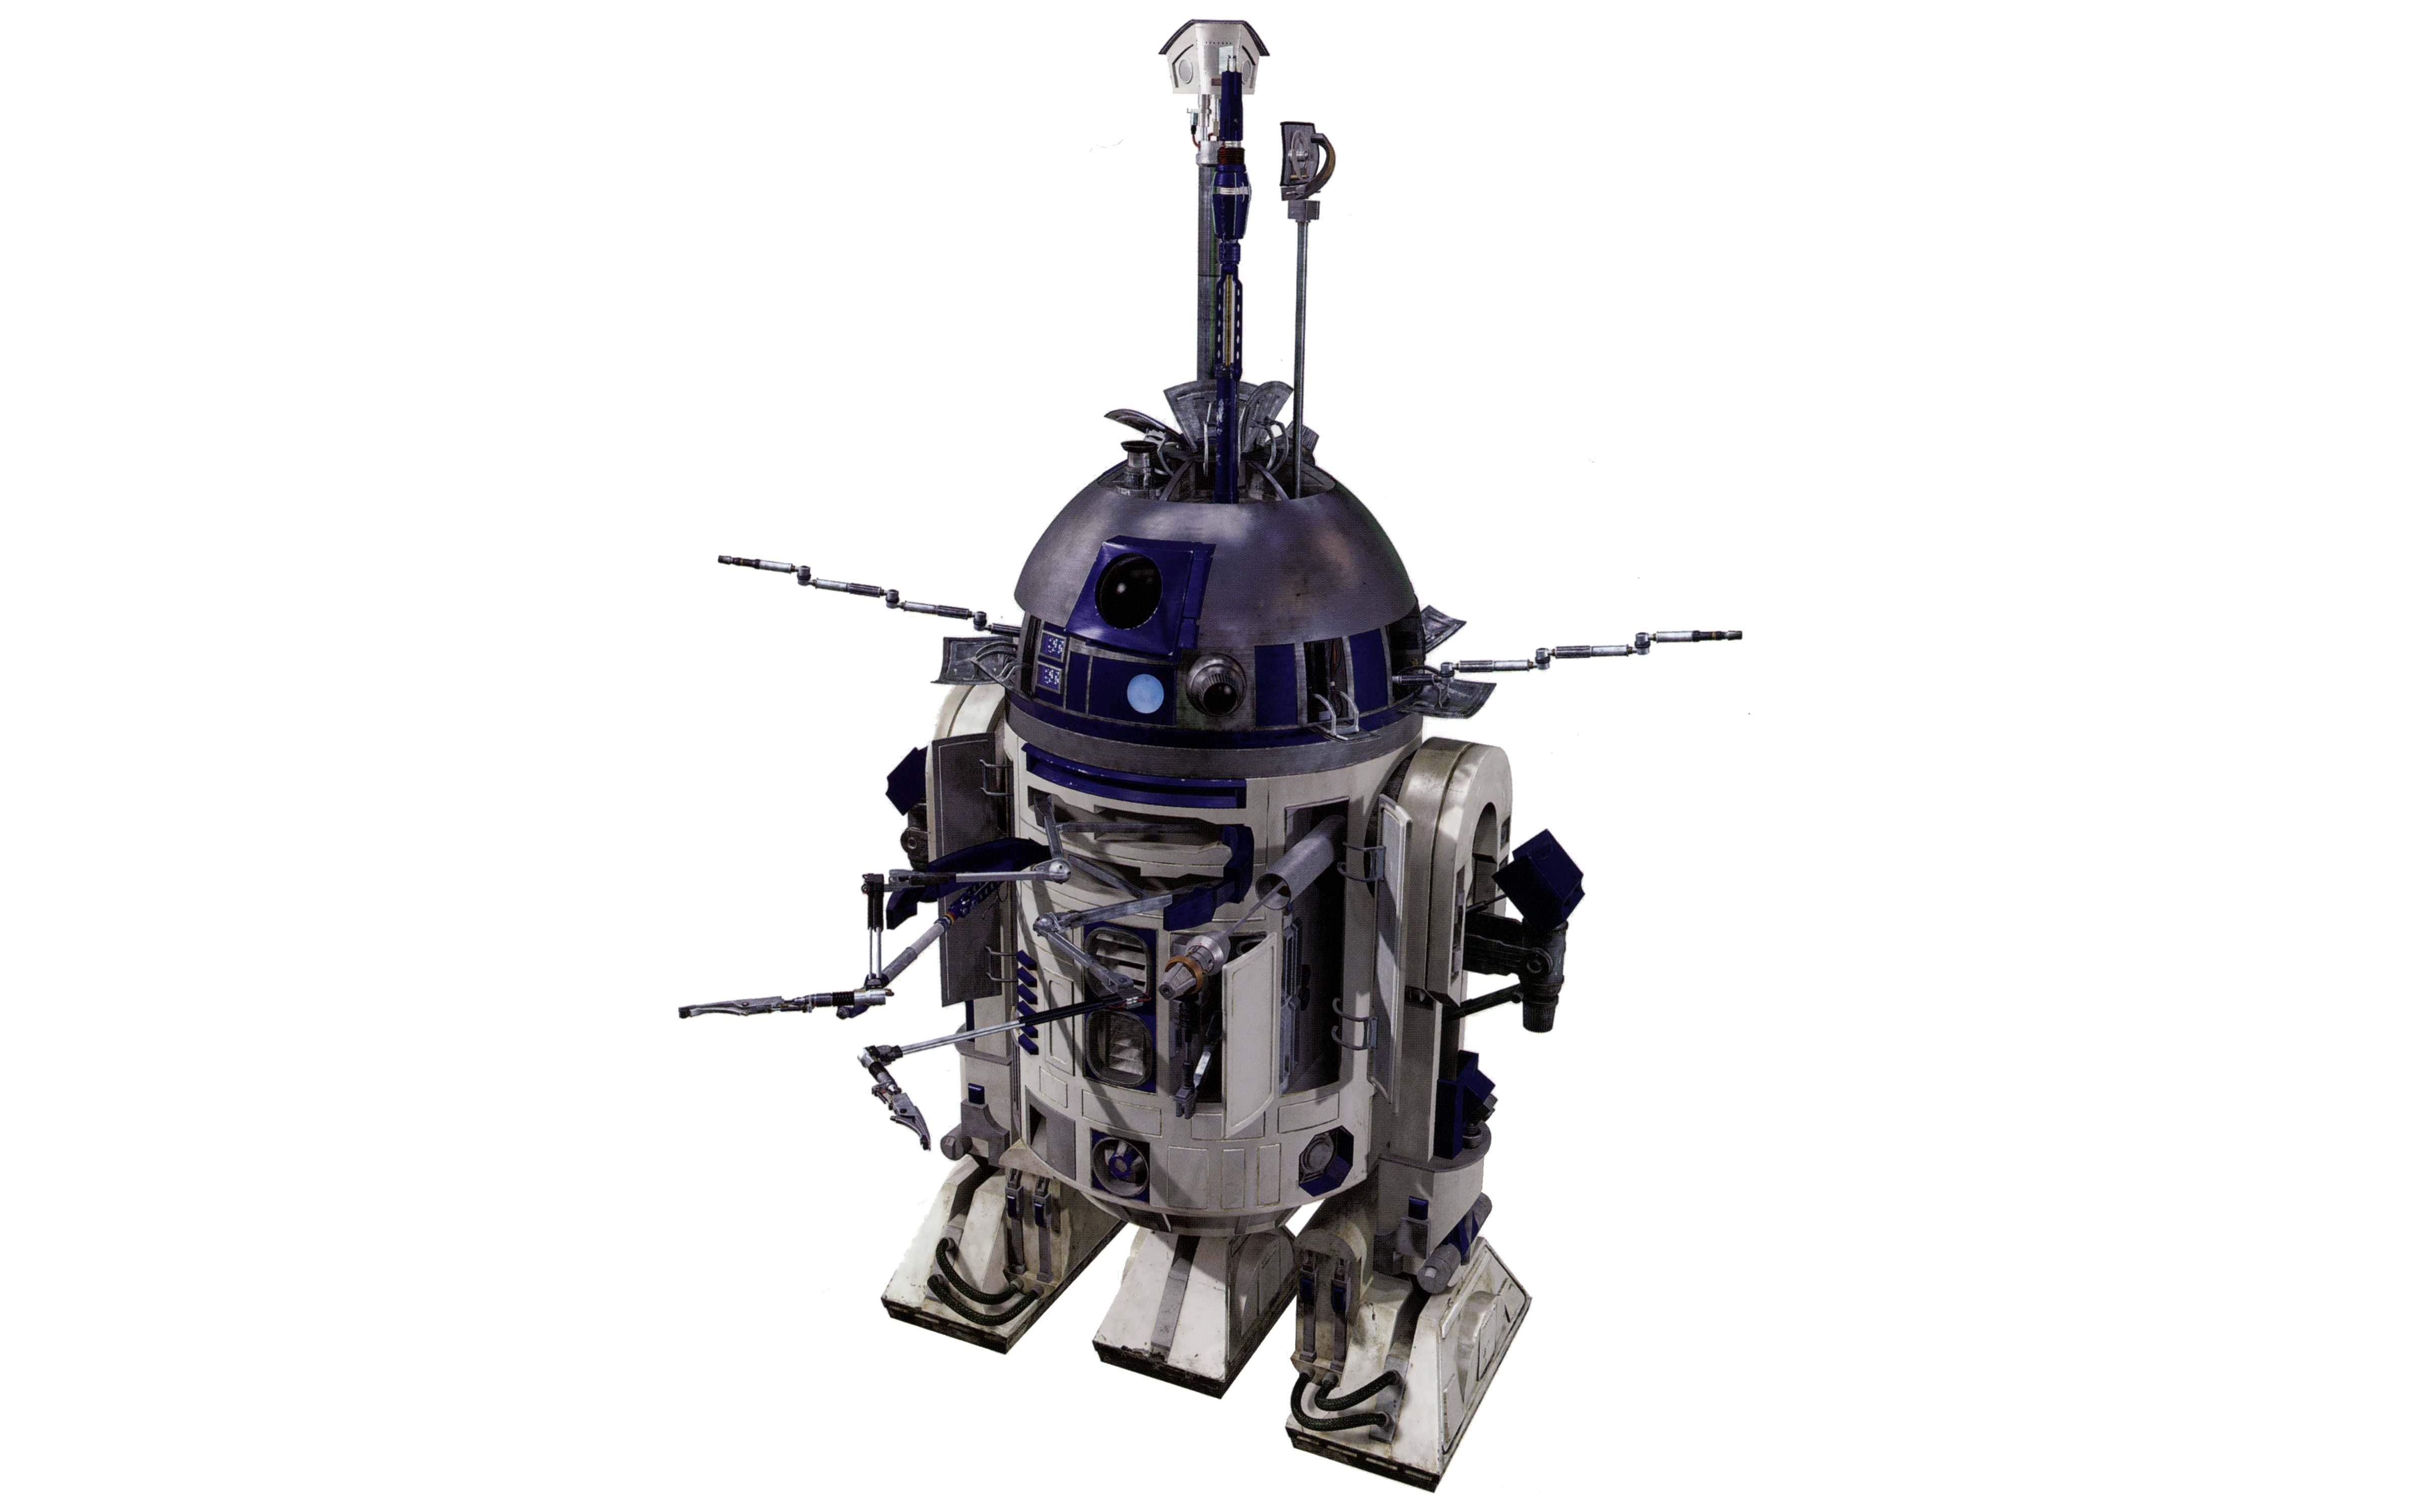 General 4812x3008 Star Wars R2-D2 Star Wars Droids white background Star Wars Heroes